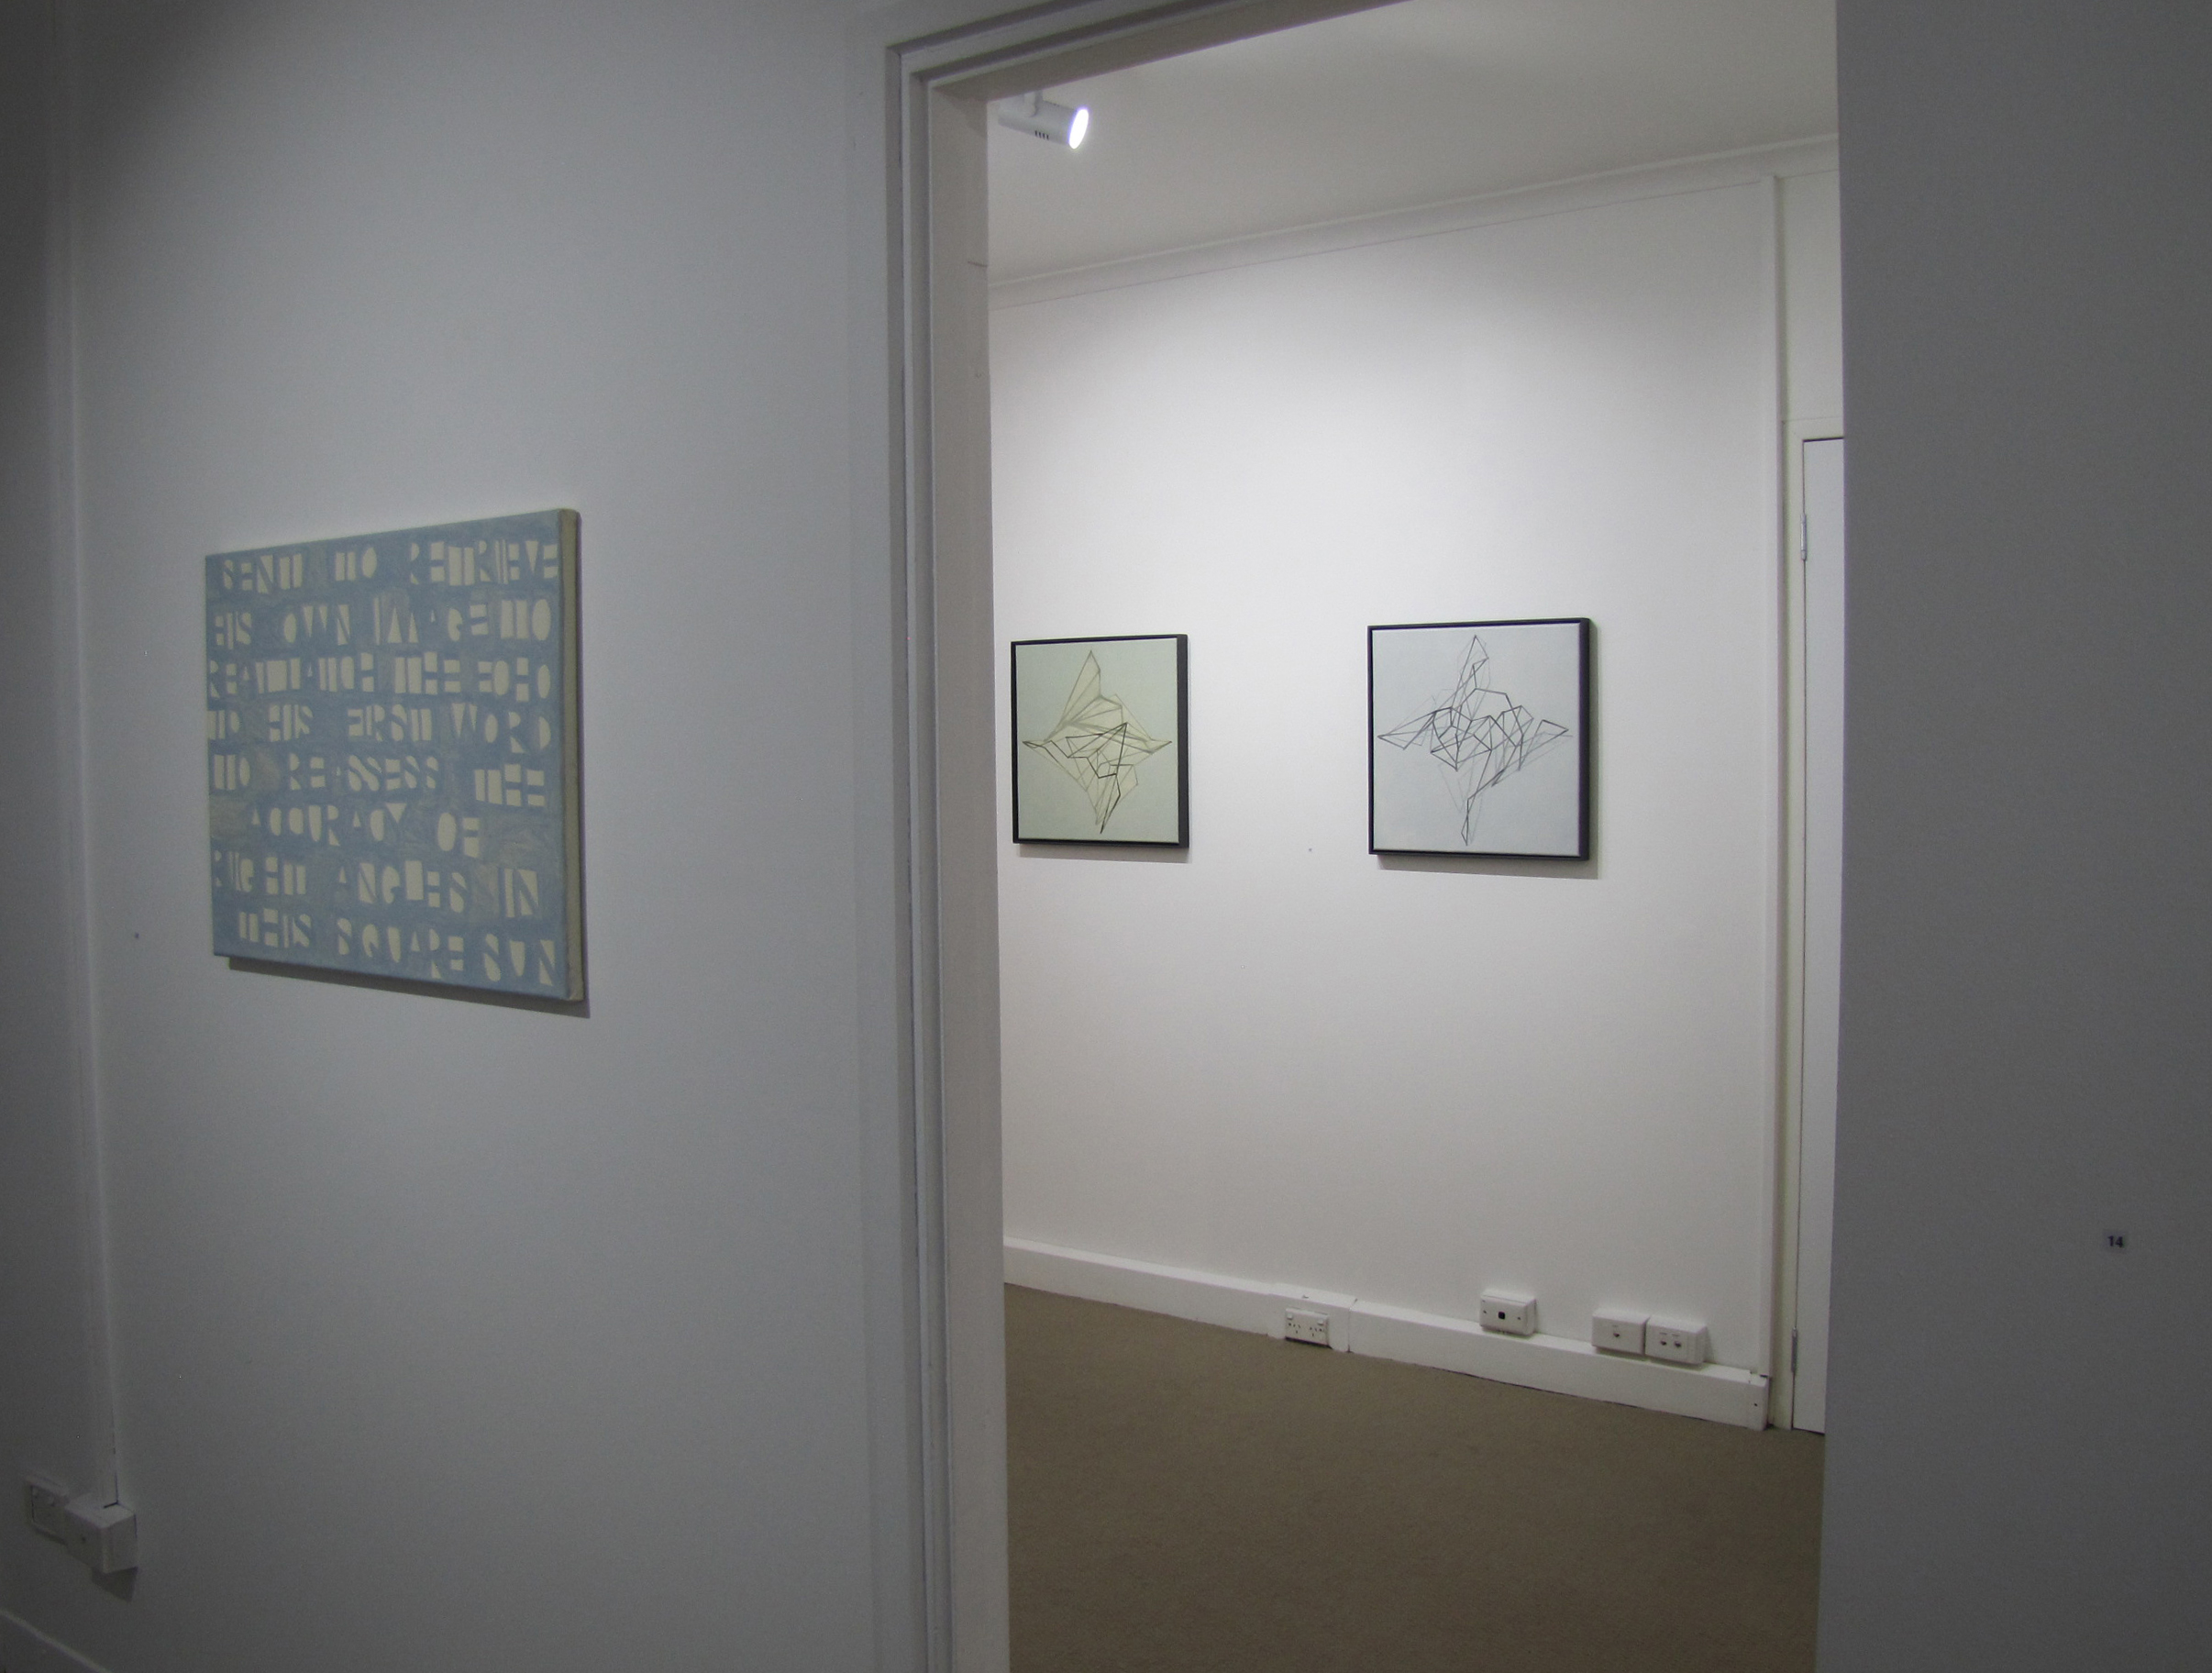 NSG. Snowball 2 exhibition. Exhibition views 10.jpg